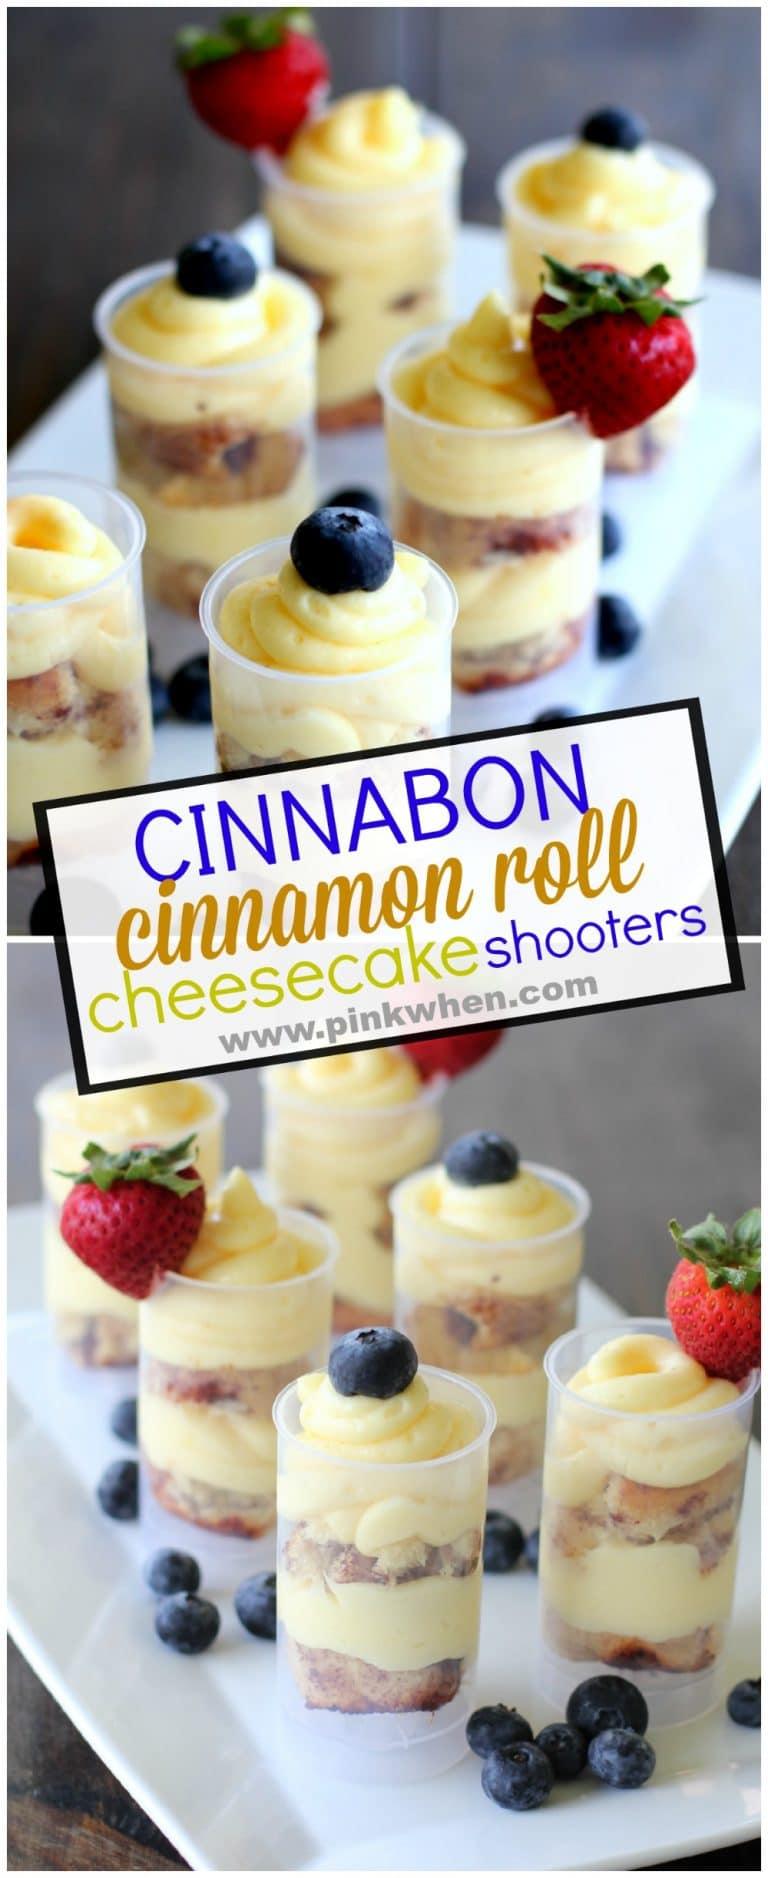 Cinnabon Cinnamon Roll Cheesecake Shooter www.pinkwhen.com